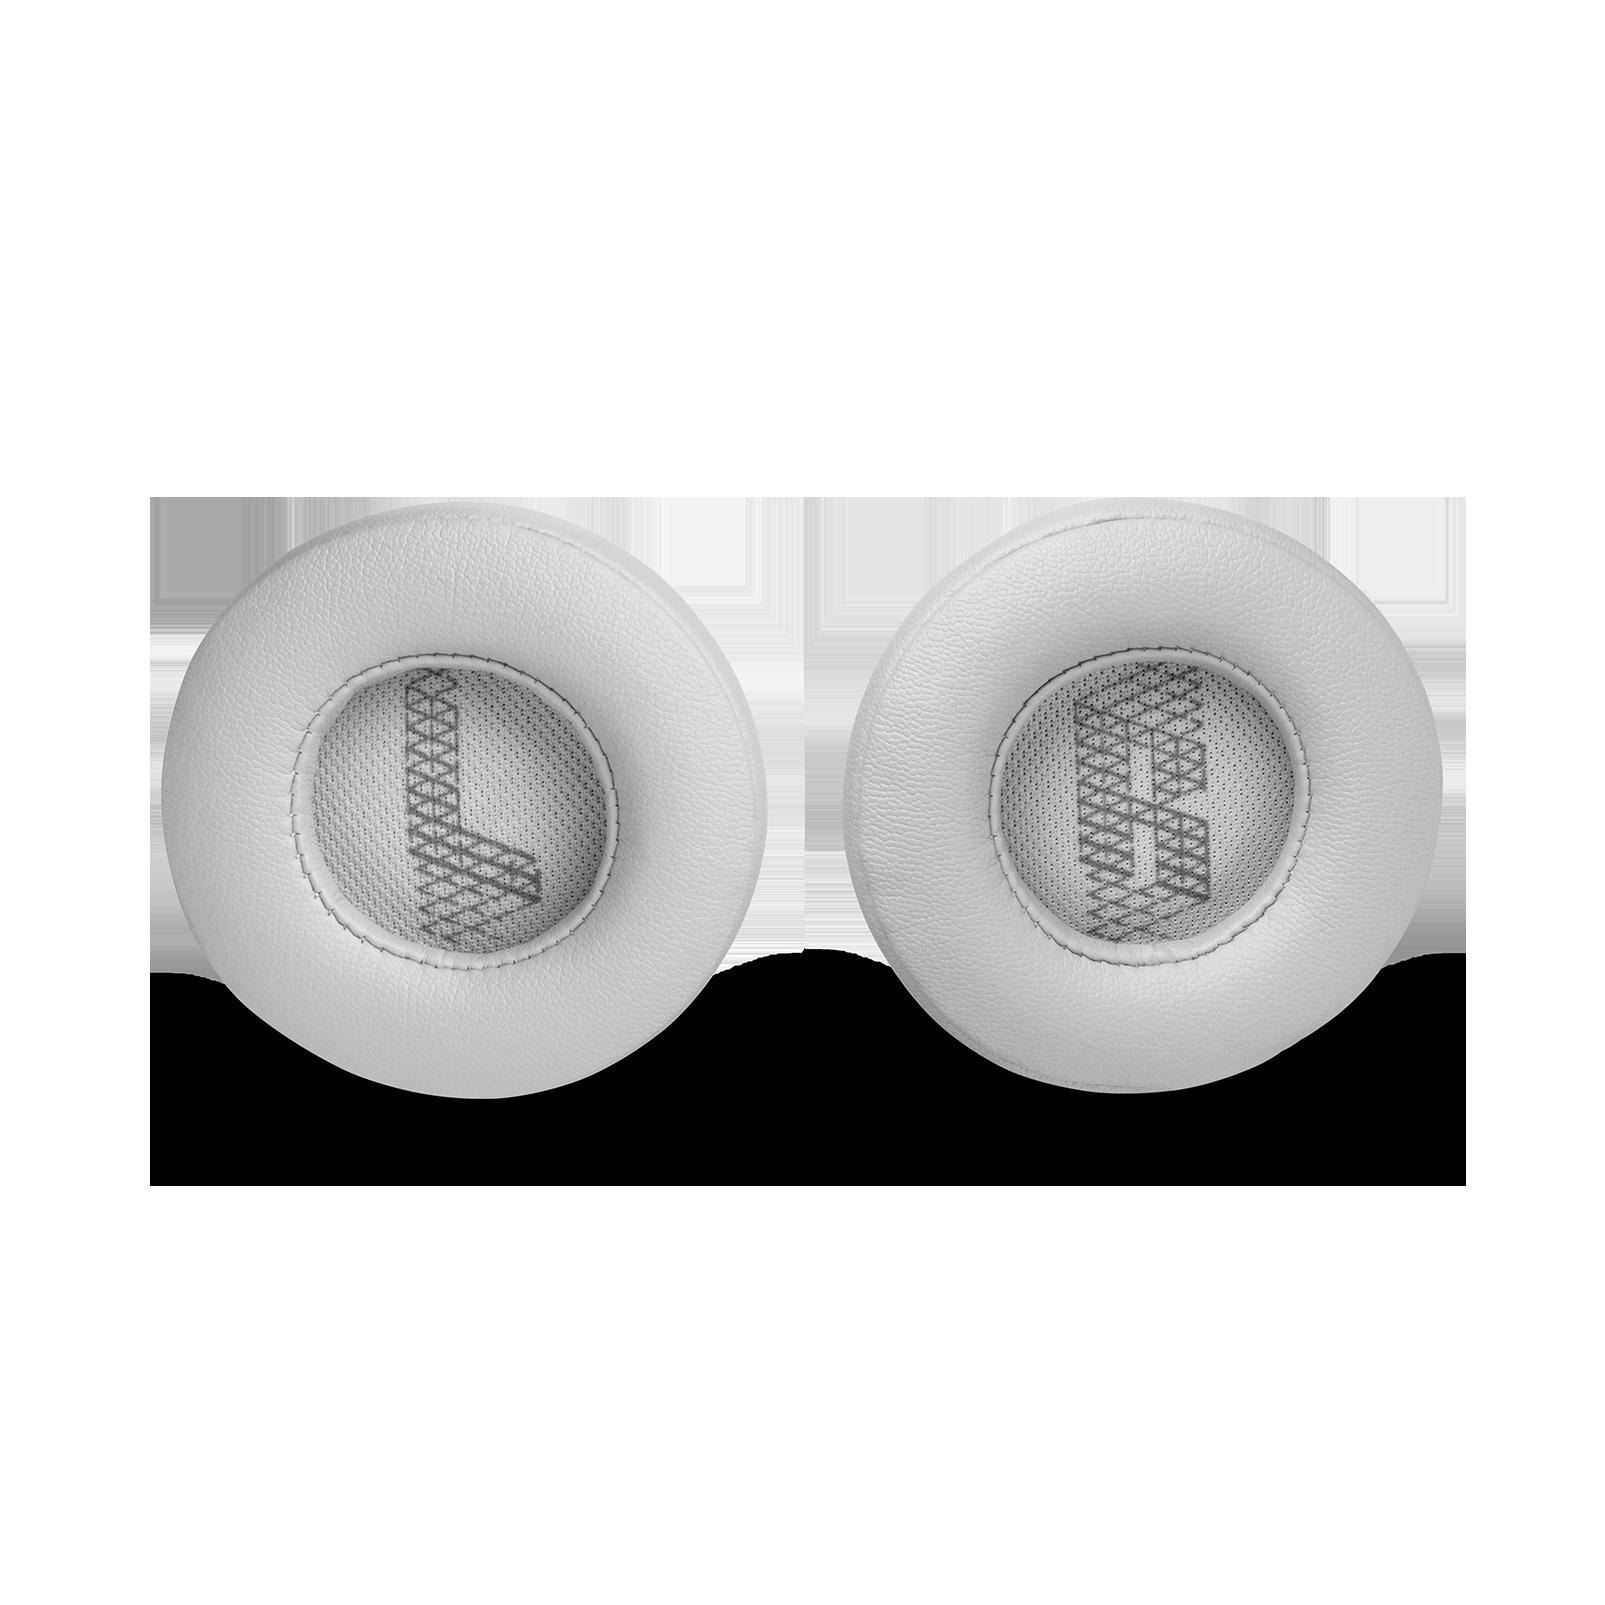 JBL Ear pads for Live 400 - White - Ear pads (L+R) - Hero